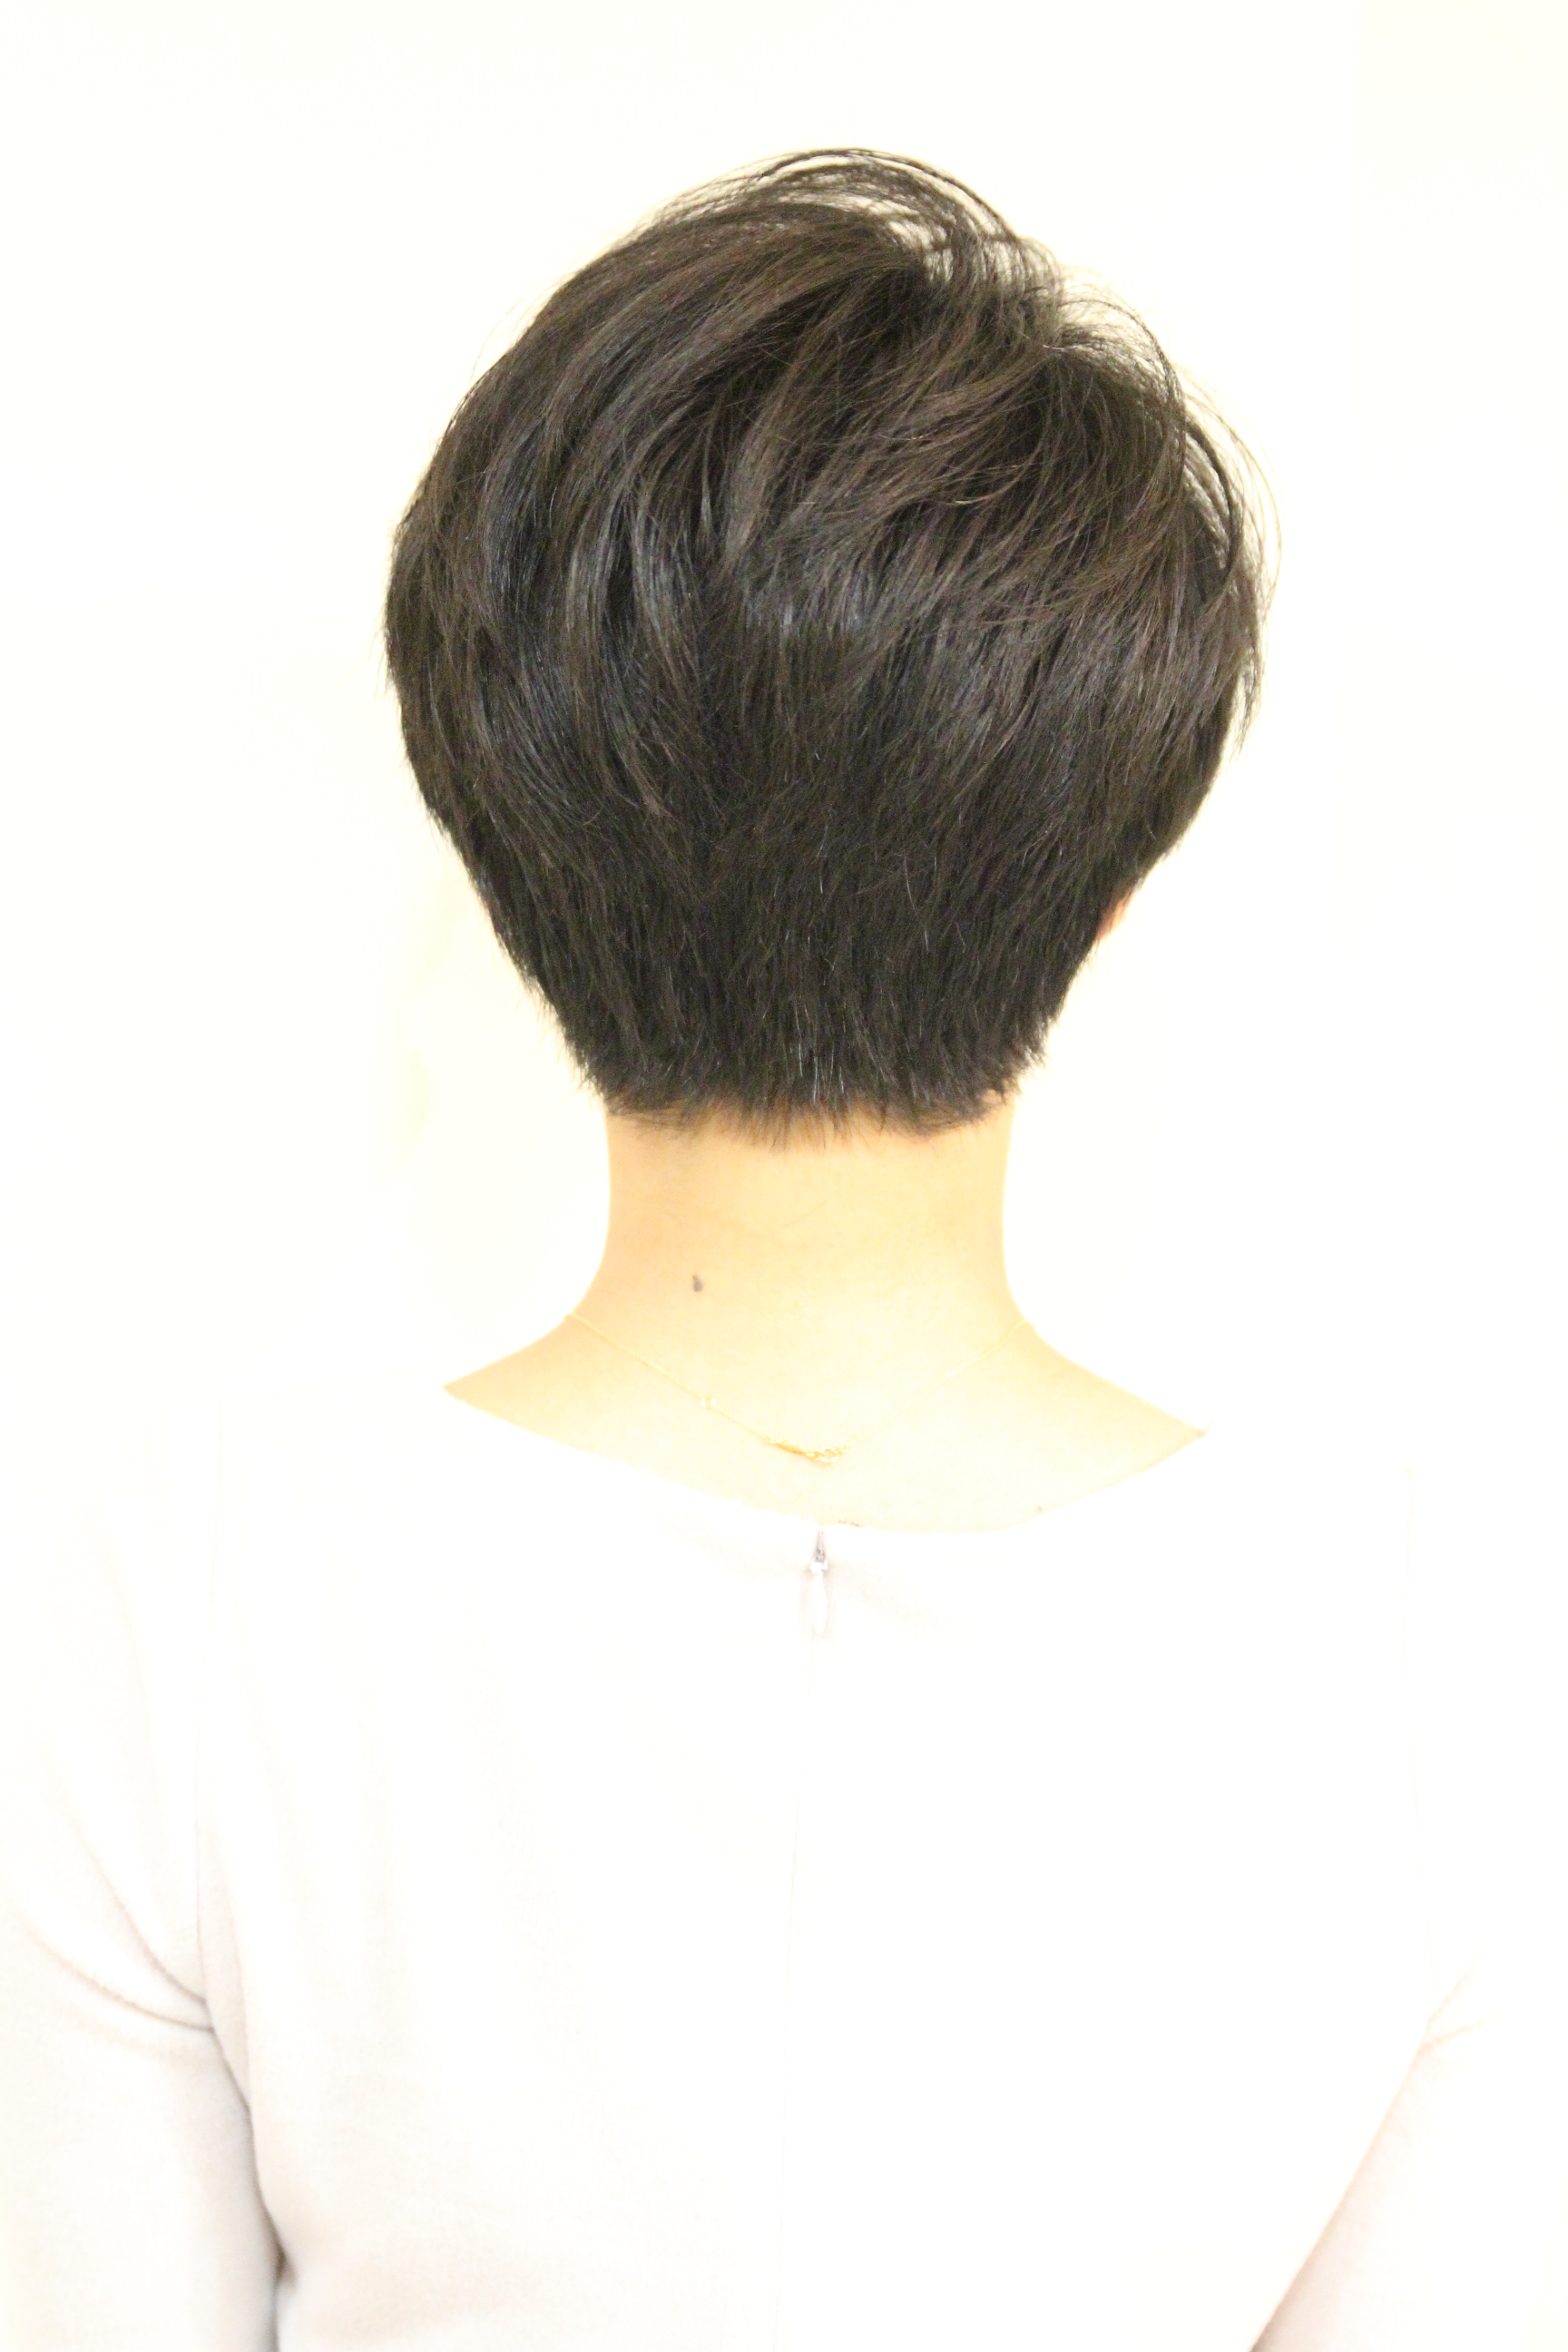 20161110_1